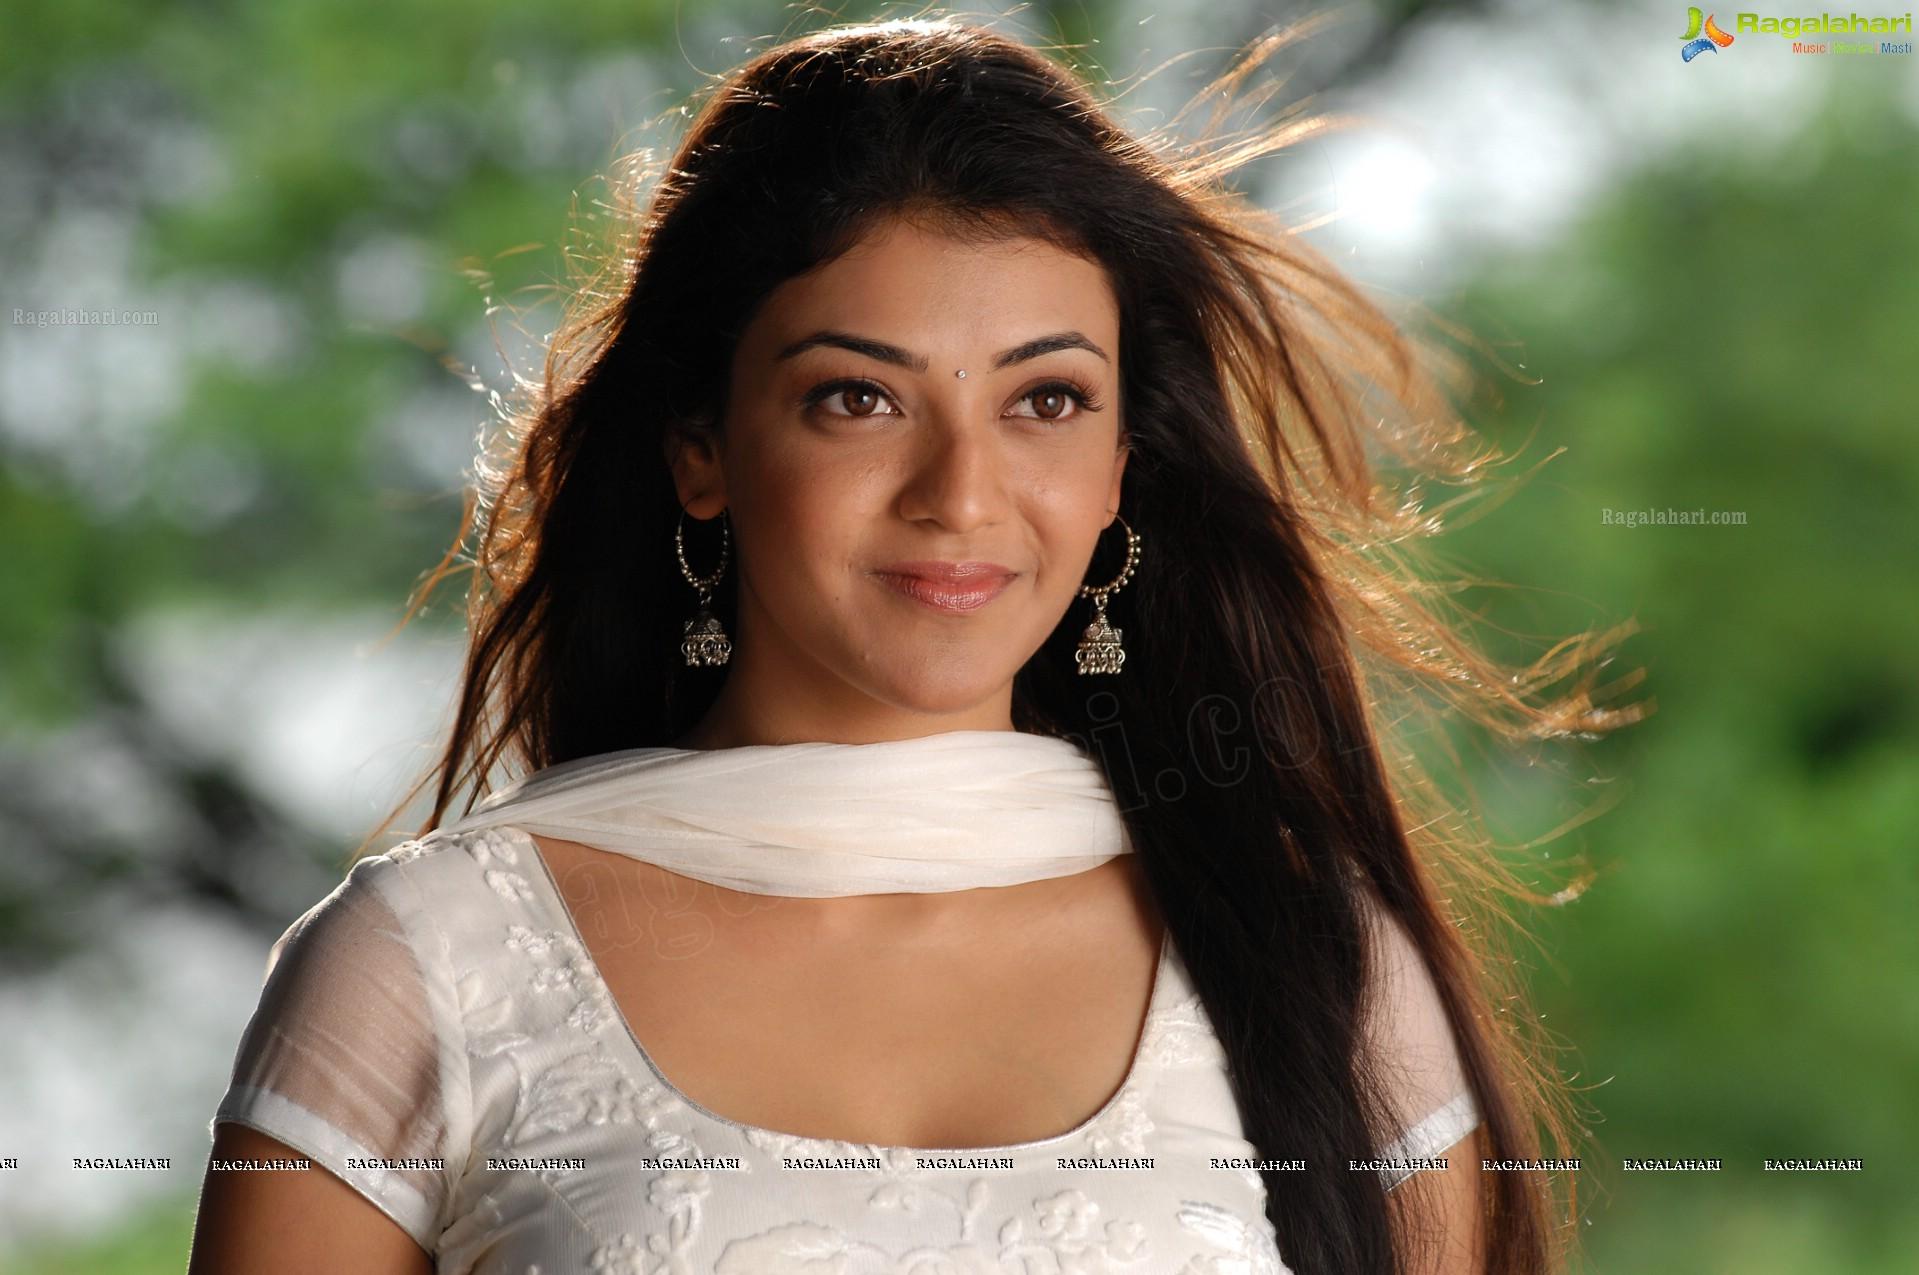 kajal agarwal (hd) image 10 | tollywood actress images,telugu